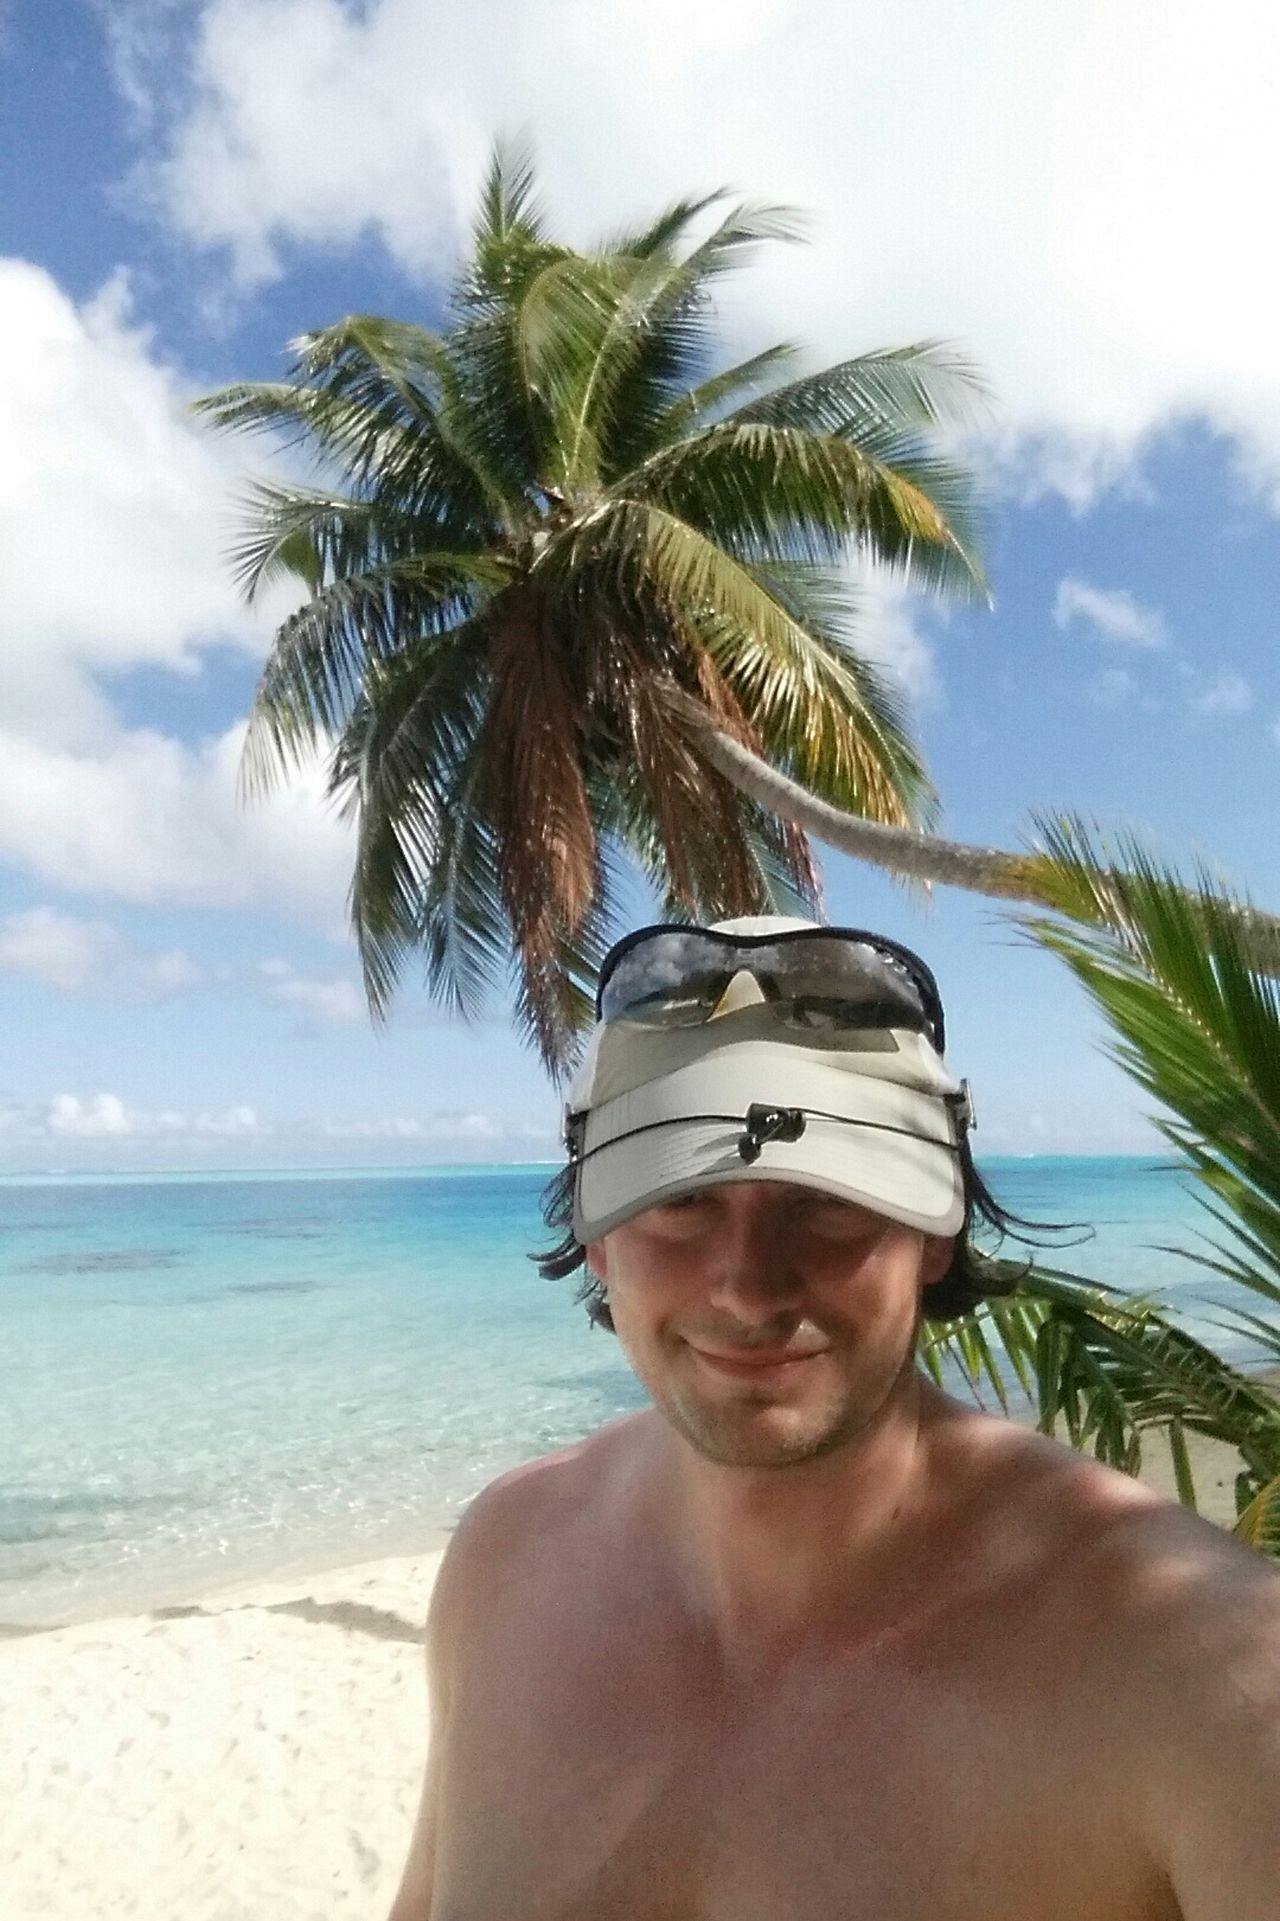 Beautiful stock photos of bora bora, palm tree, sunglasses, sky, looking at camera